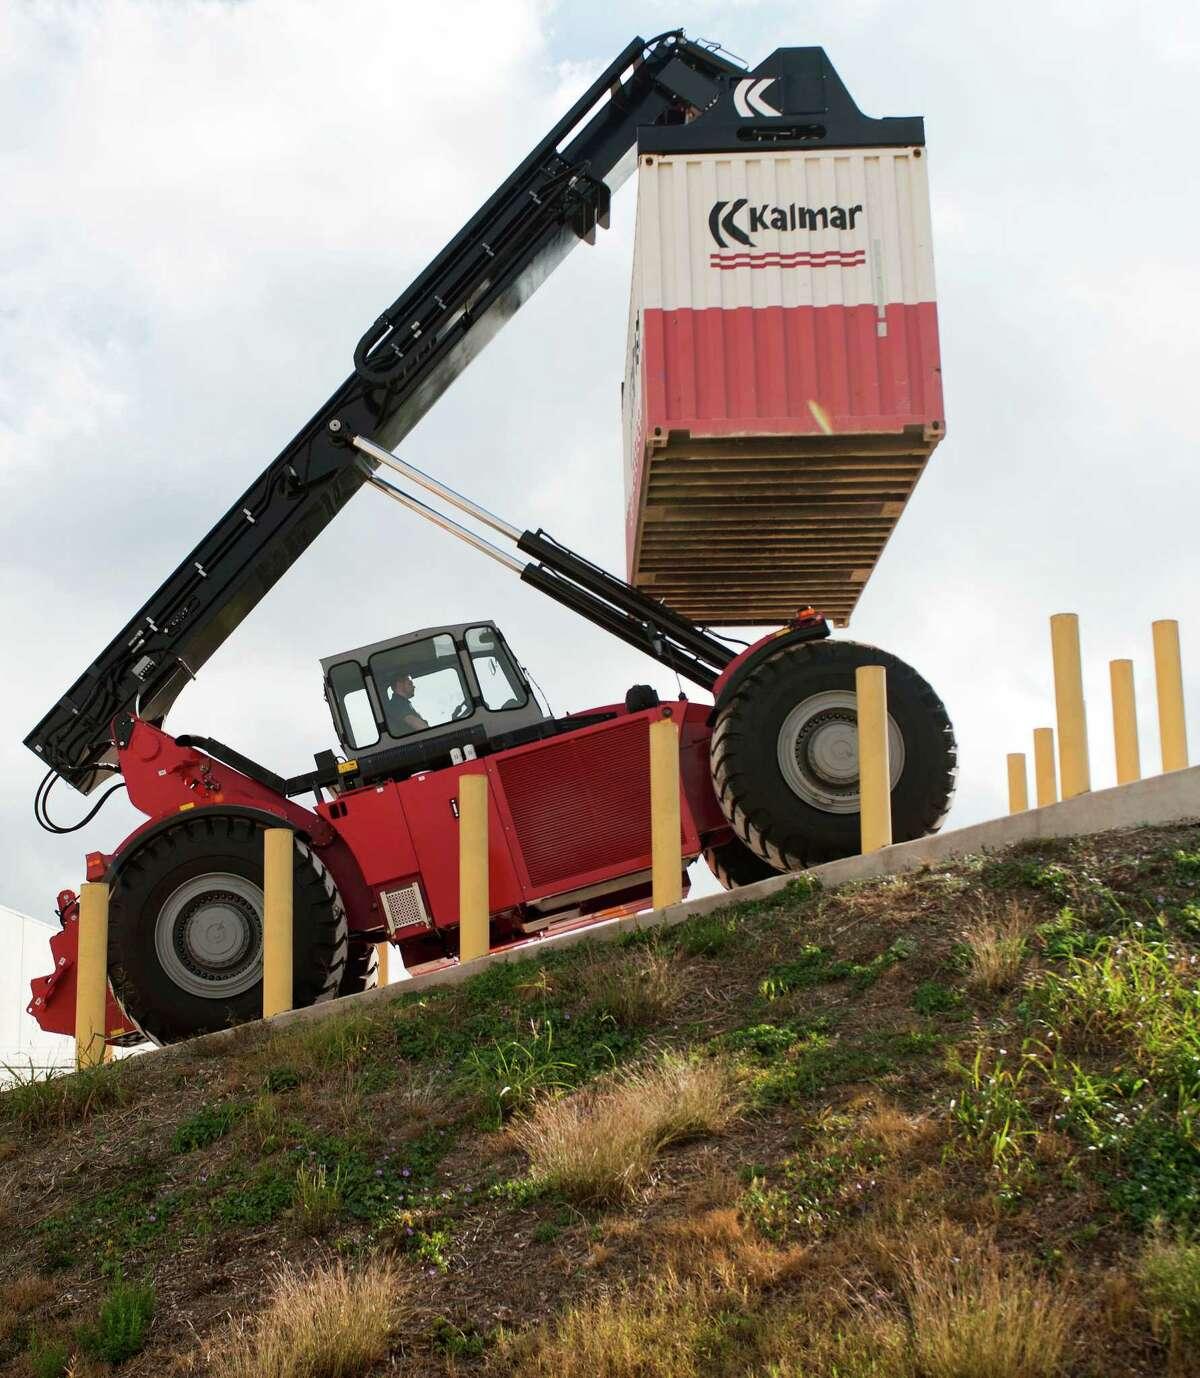 A Kalmar RT240 rough terrain reach stacker is demonstrated, Friday, Nov. 2, 2012, at the Kalmar RT Center production facility in Cibolo, Texas.